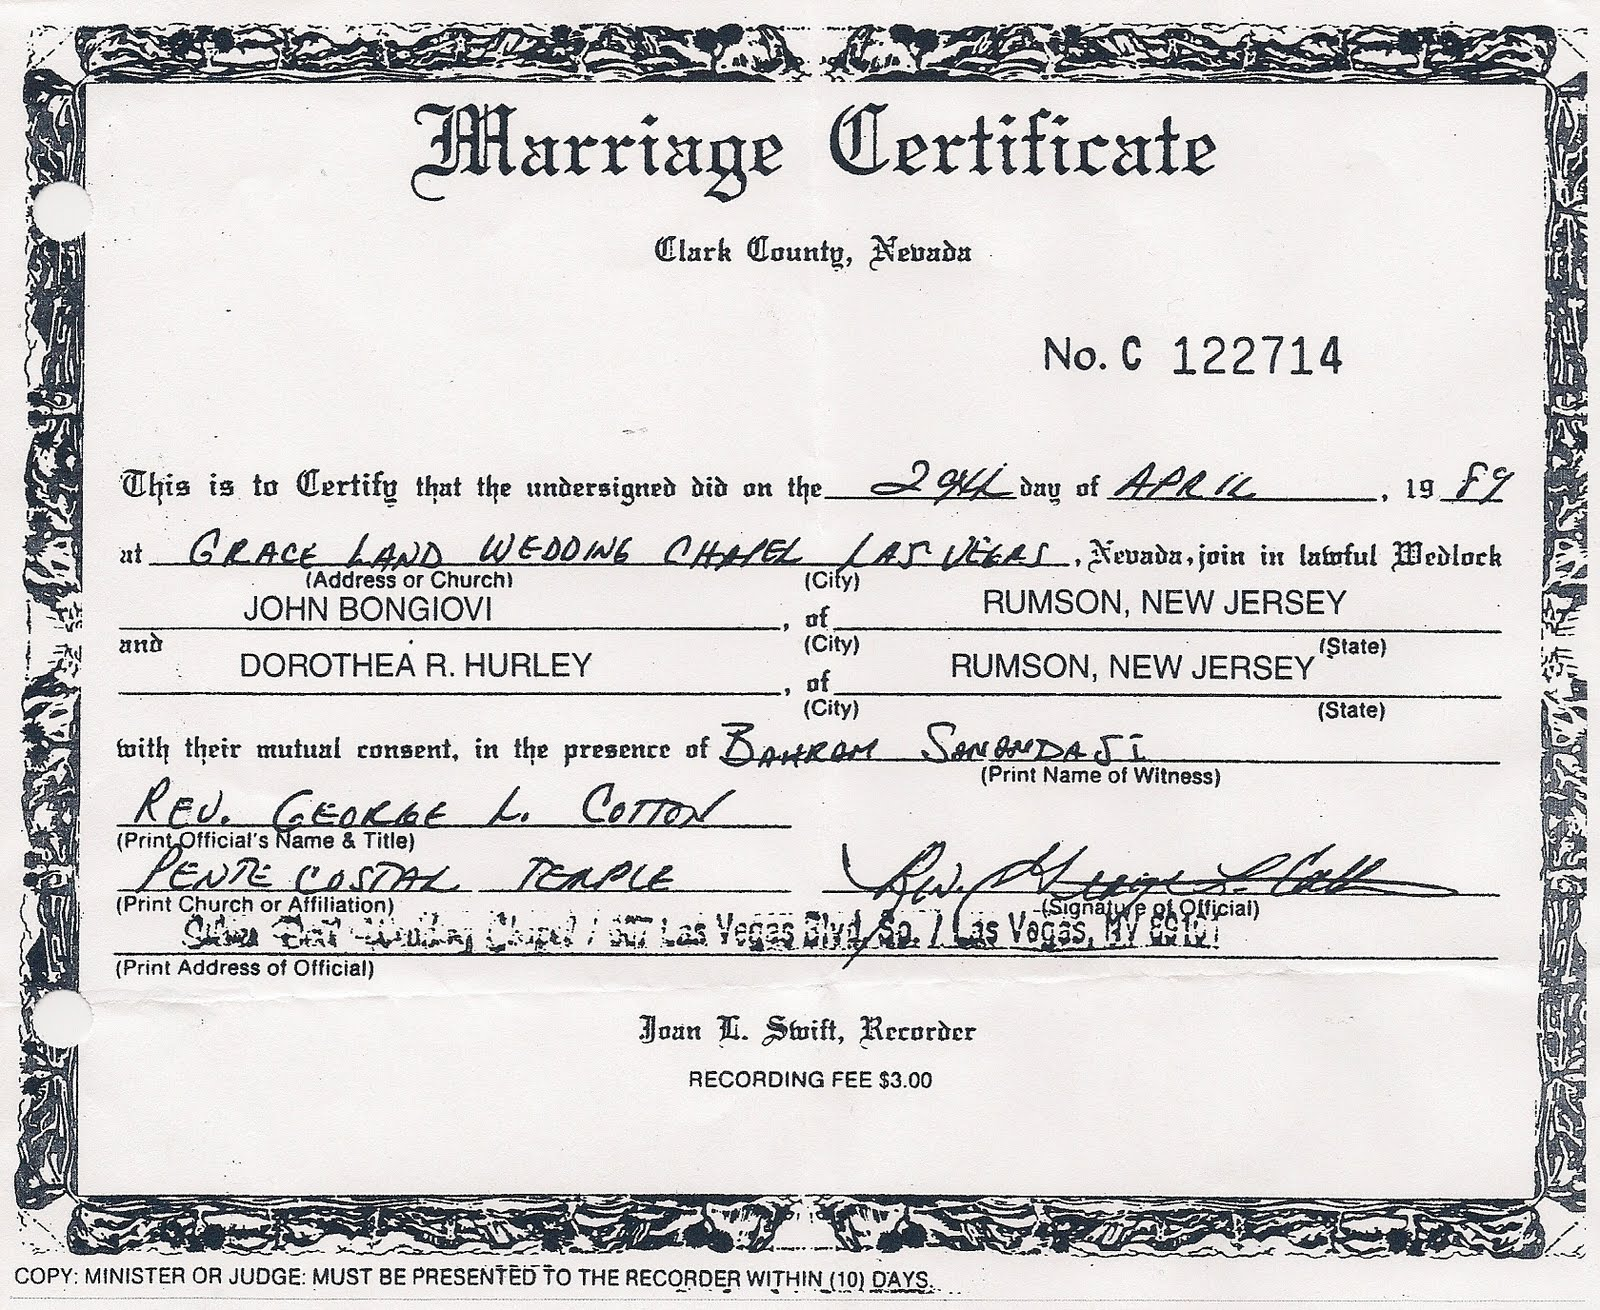 Marriage Certificate Las Vegas Images Creative Certificate Design